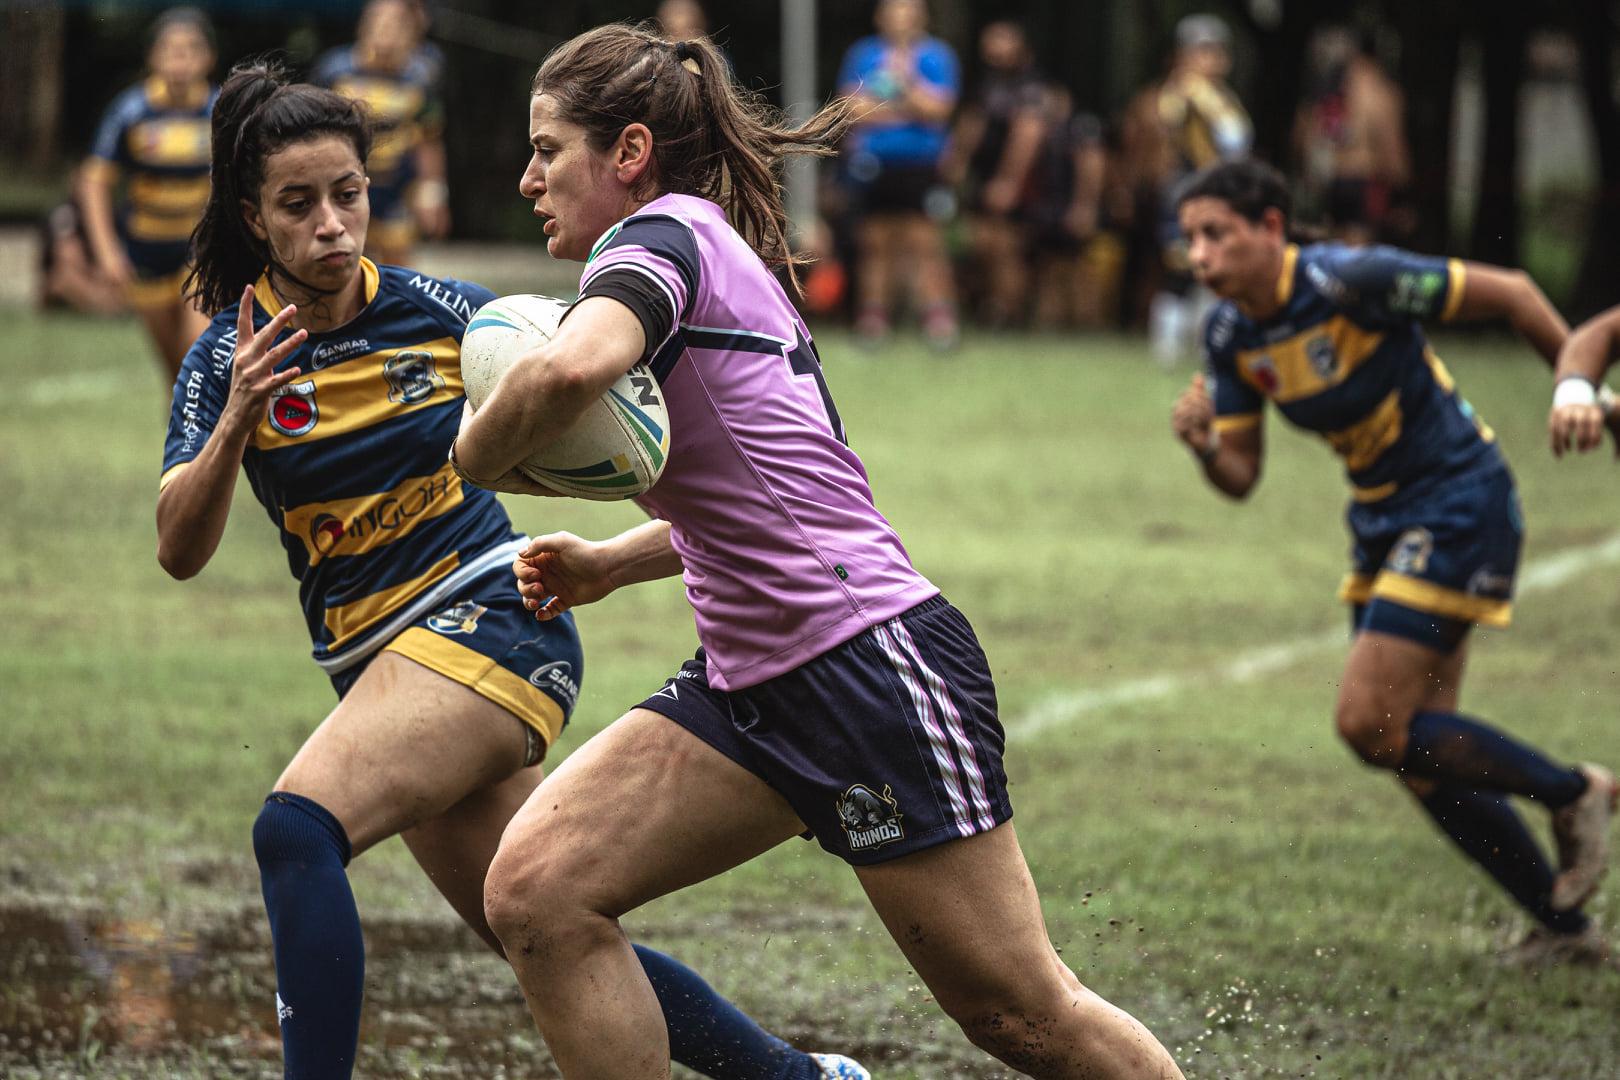 Brasilian Women's Premiership Finals Series kicks off this Saturday